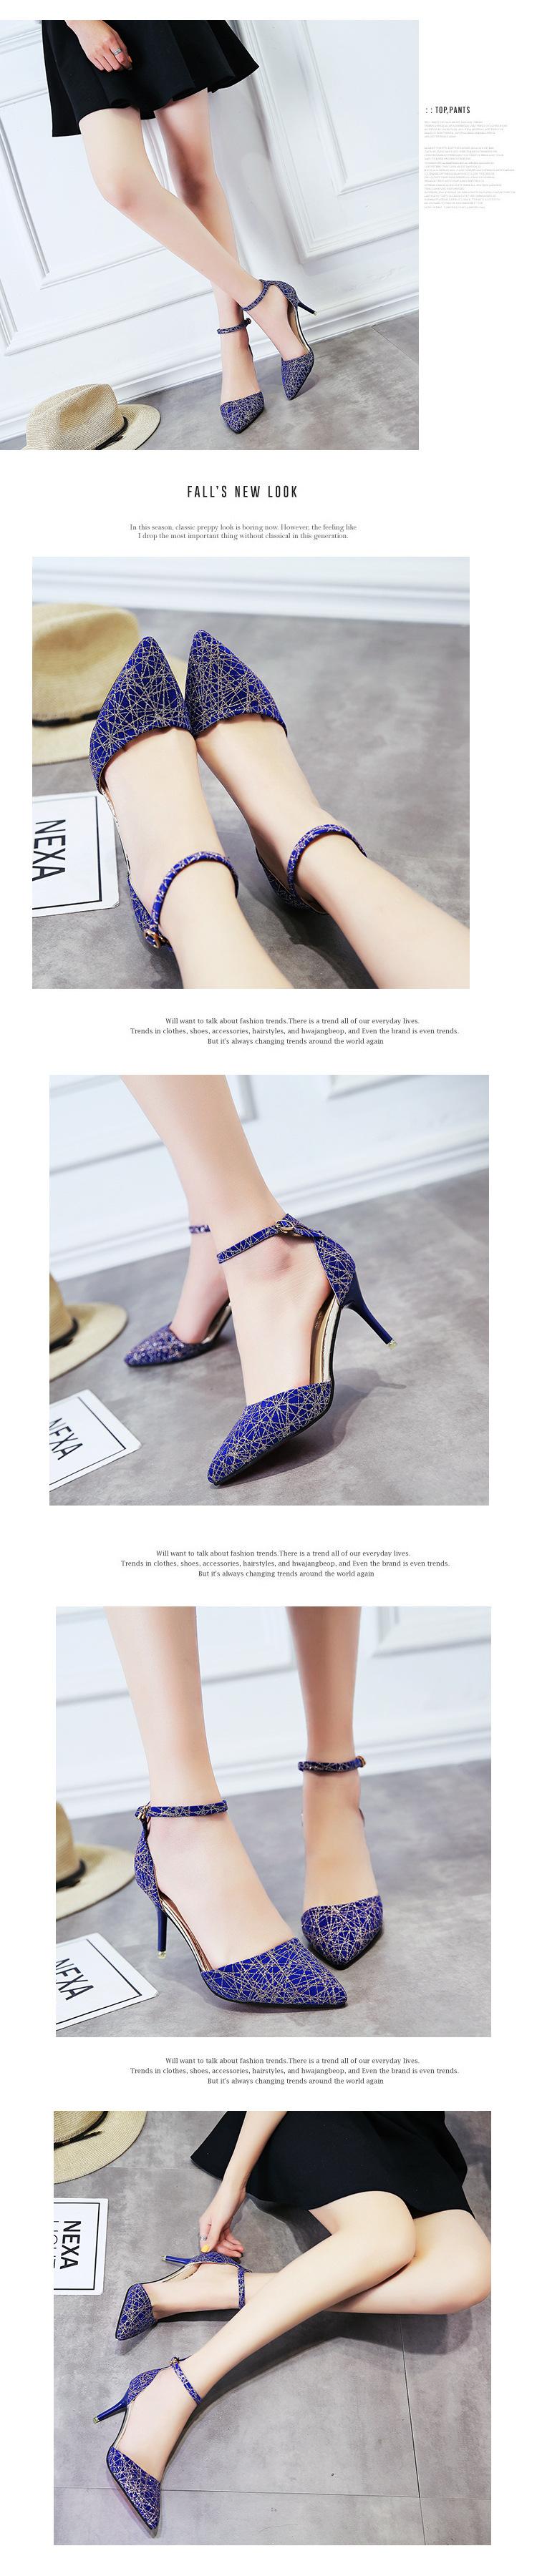 Acquista Designer Dress Shoes 2019 Décolleté Donna Primavera Autunno New National Wind Retro Heels Pointed Fine Con Donne Single A $19.83 Dal Bags55 |